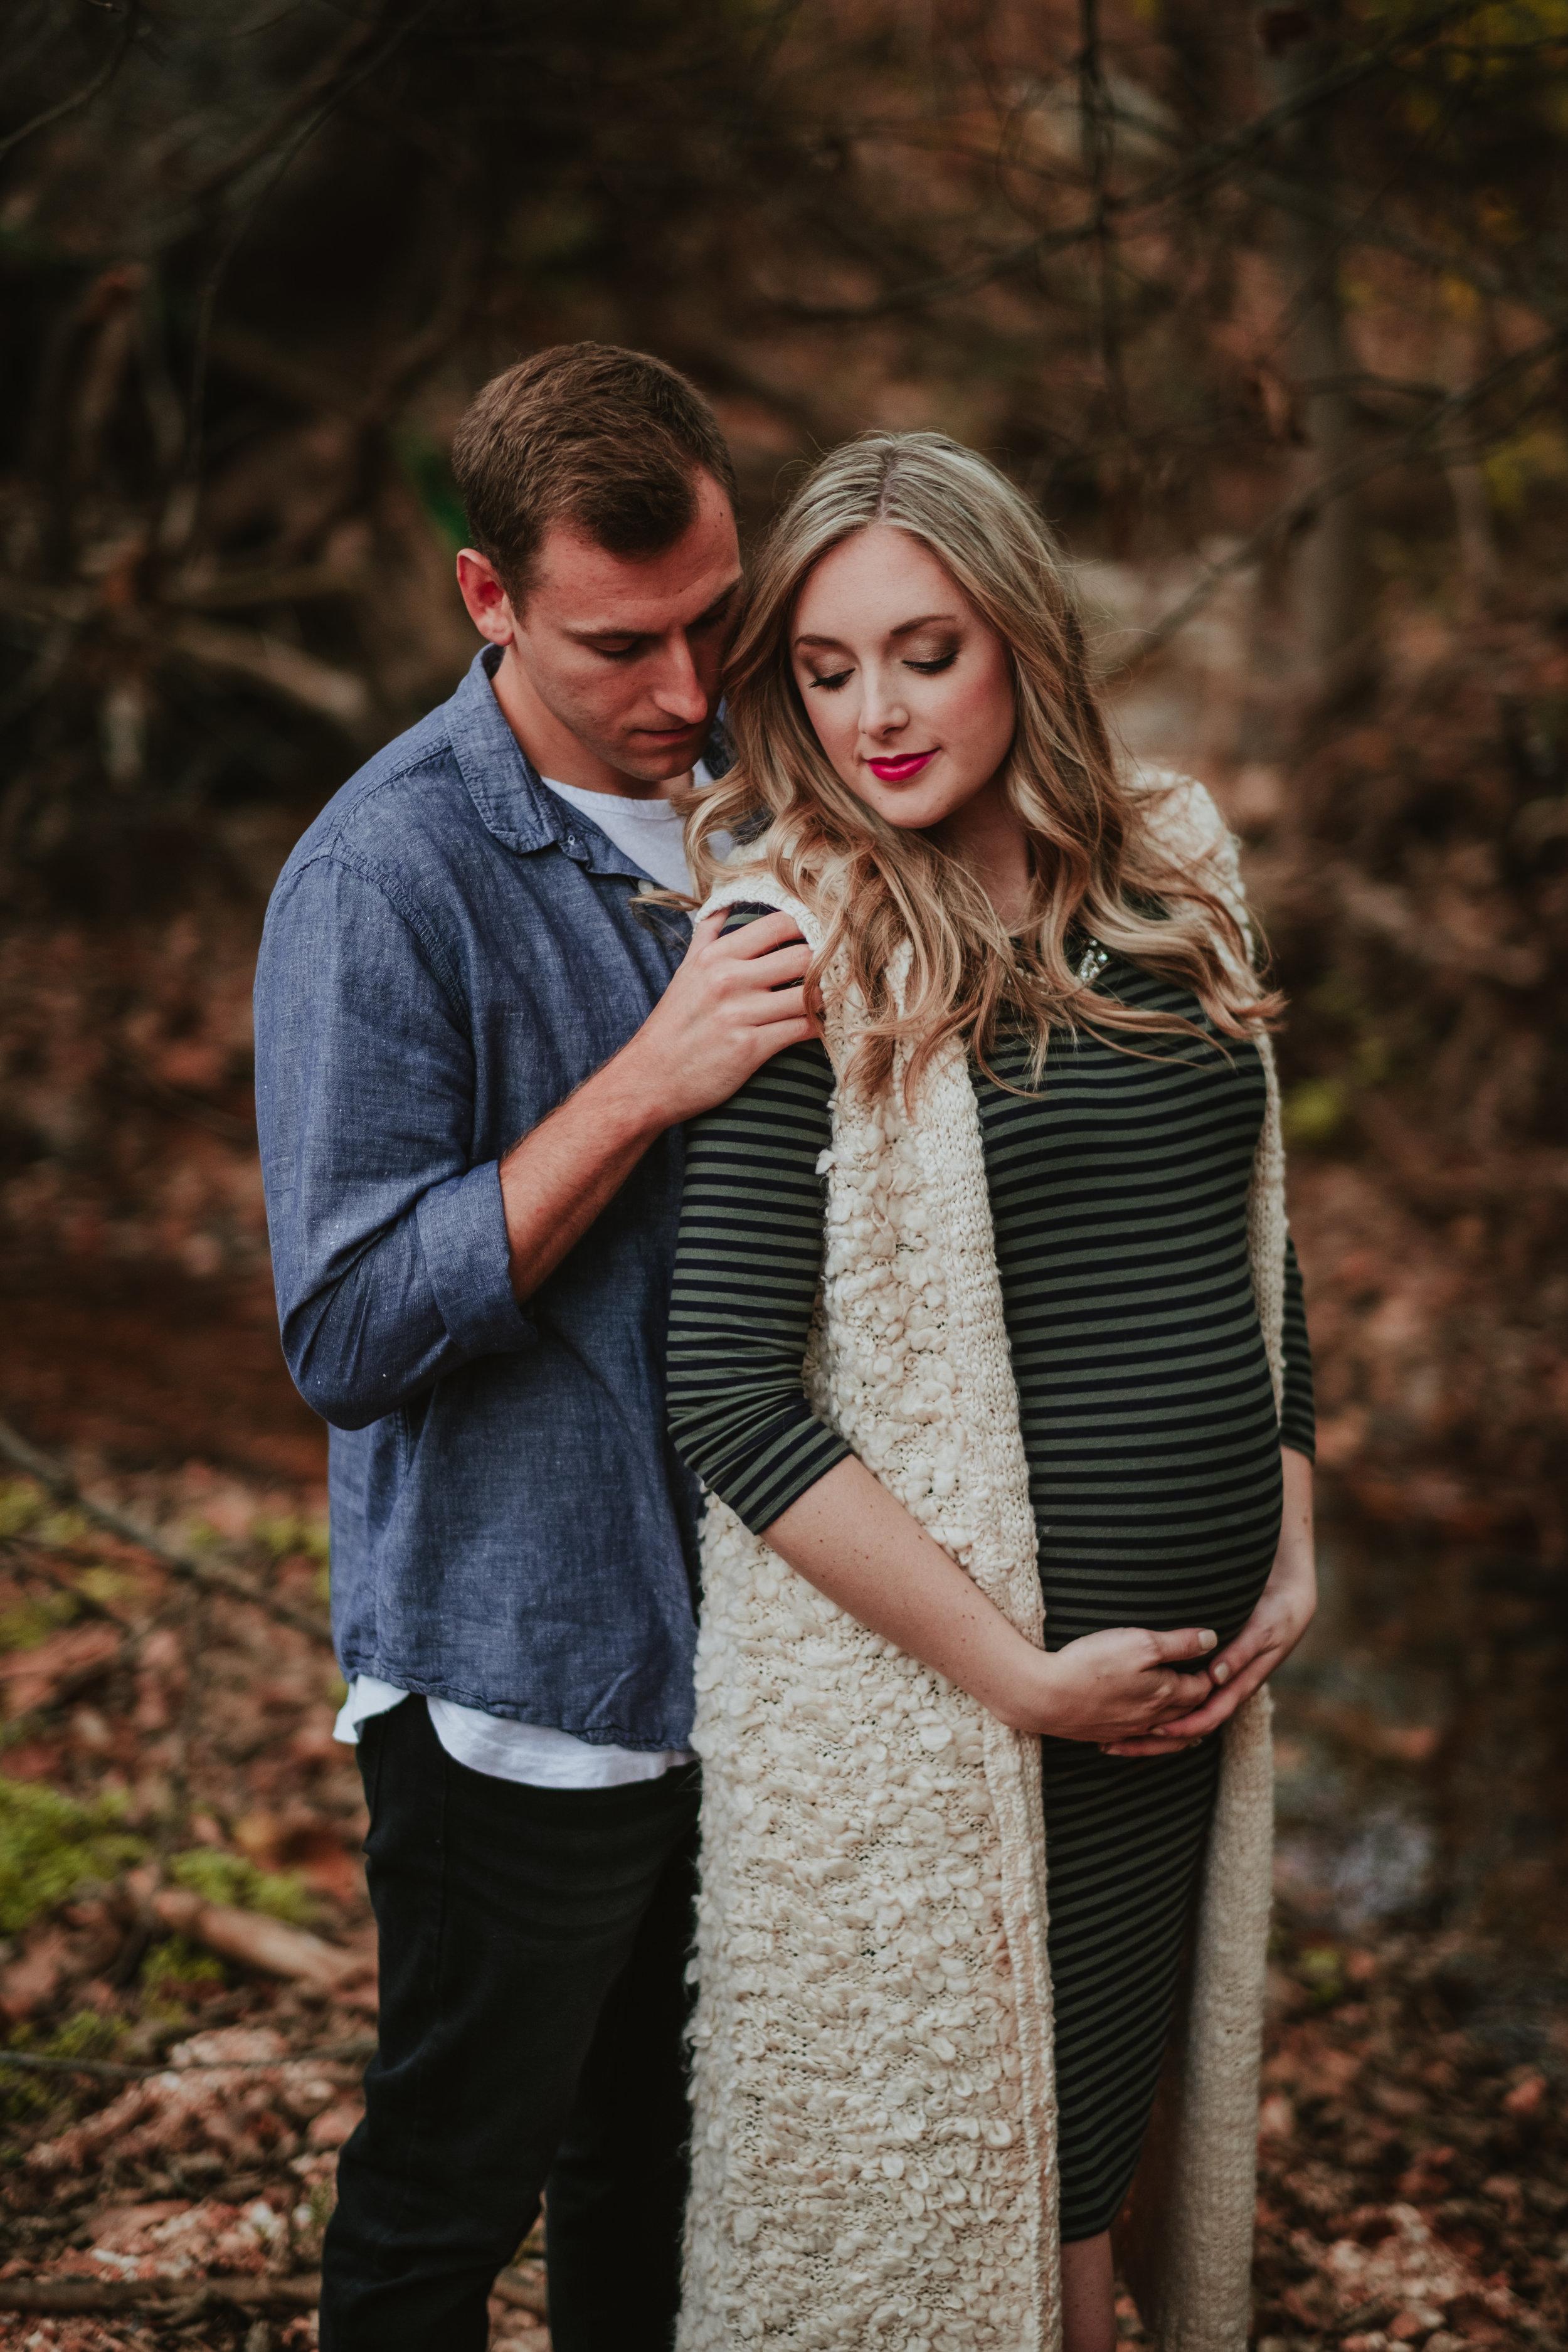 Micah.Chris.Maternity.2016.Delyn.Megan.Stirewalt-13.jpg